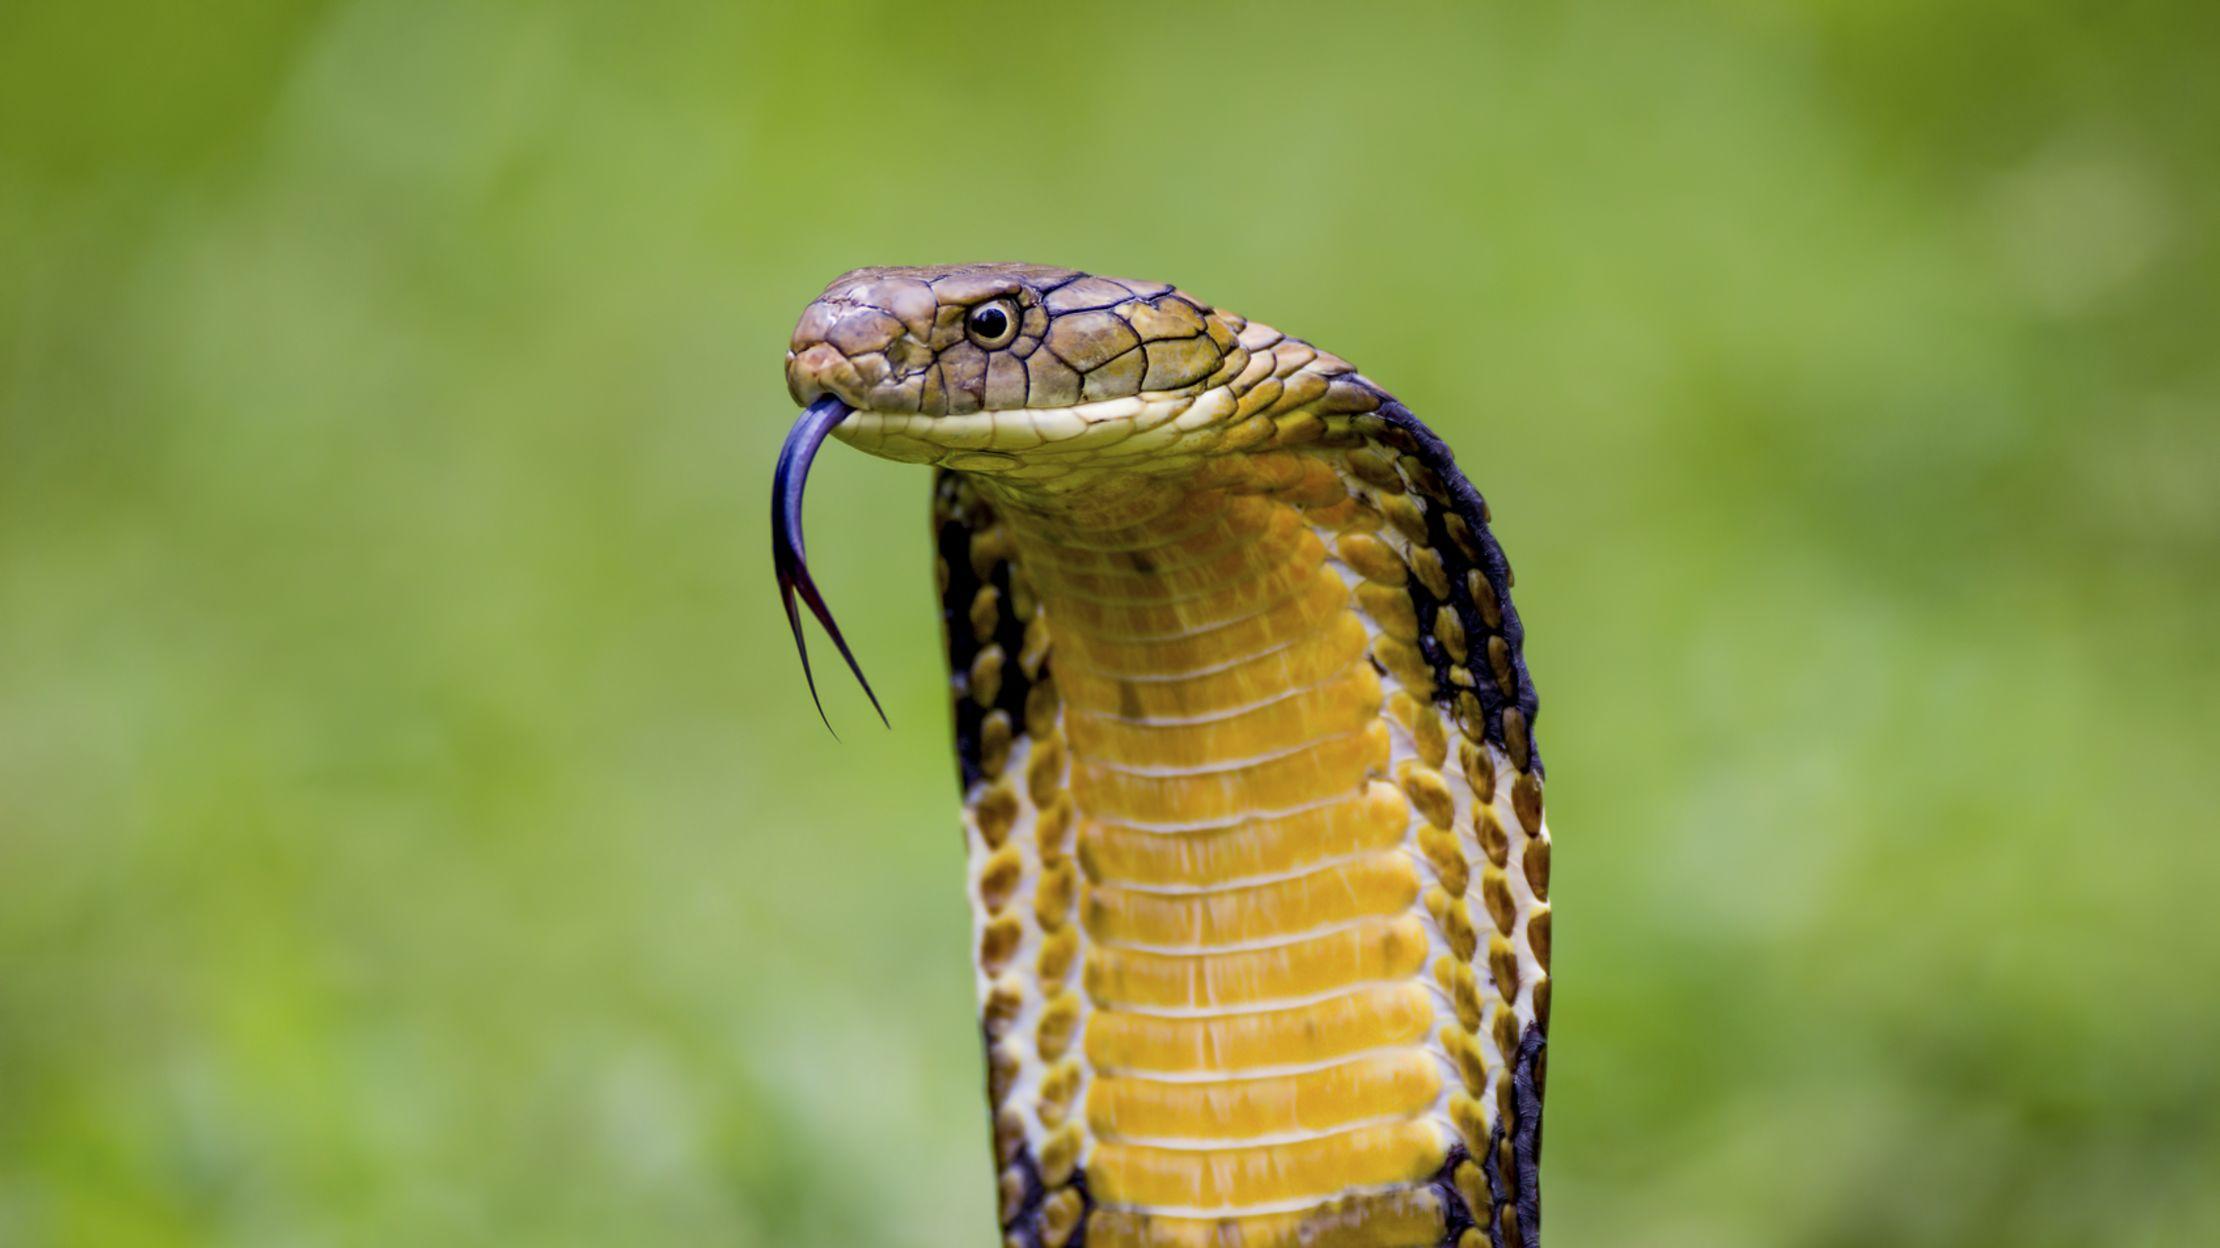 12 Ferocious Facts About King Cobras | Mental Floss